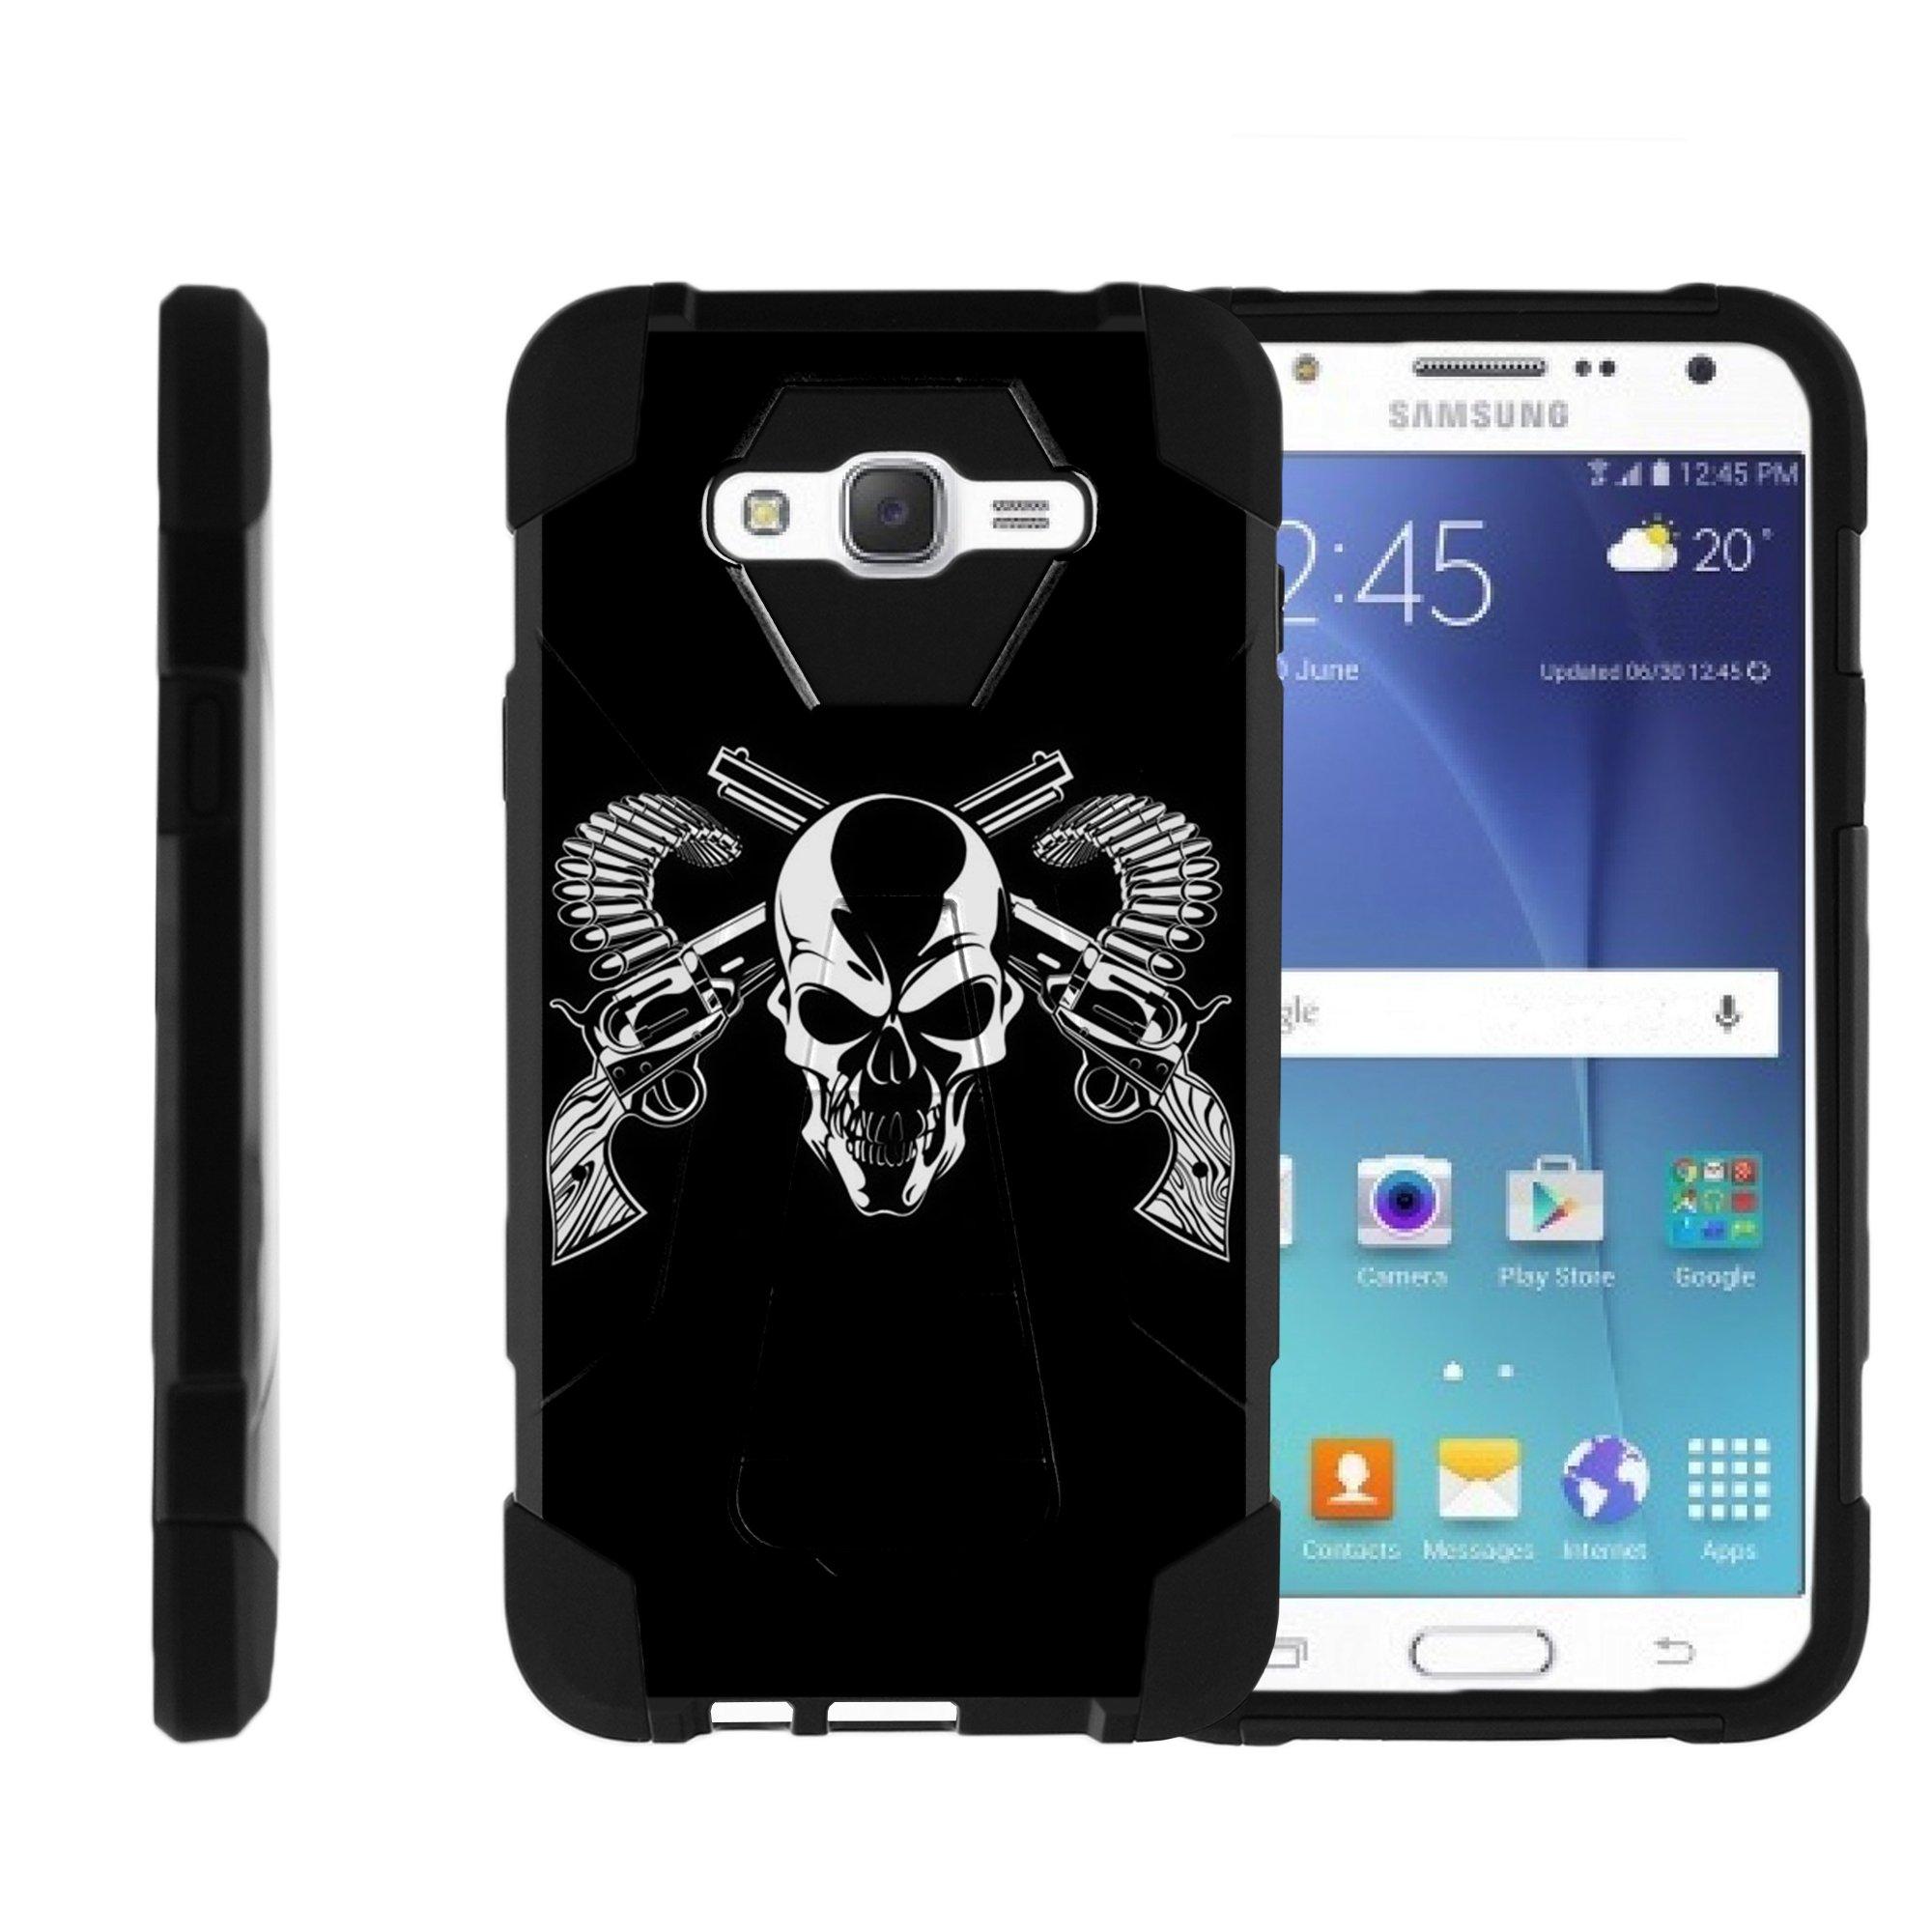 TurtleArmor ® | For Samsung Galaxy J7 J700, J700F, J700M, J700H (2015) [Dynamic Shell] Dual Layer Hybrid Silicone Hard Shell Kickstand Case - Mercenary Skull